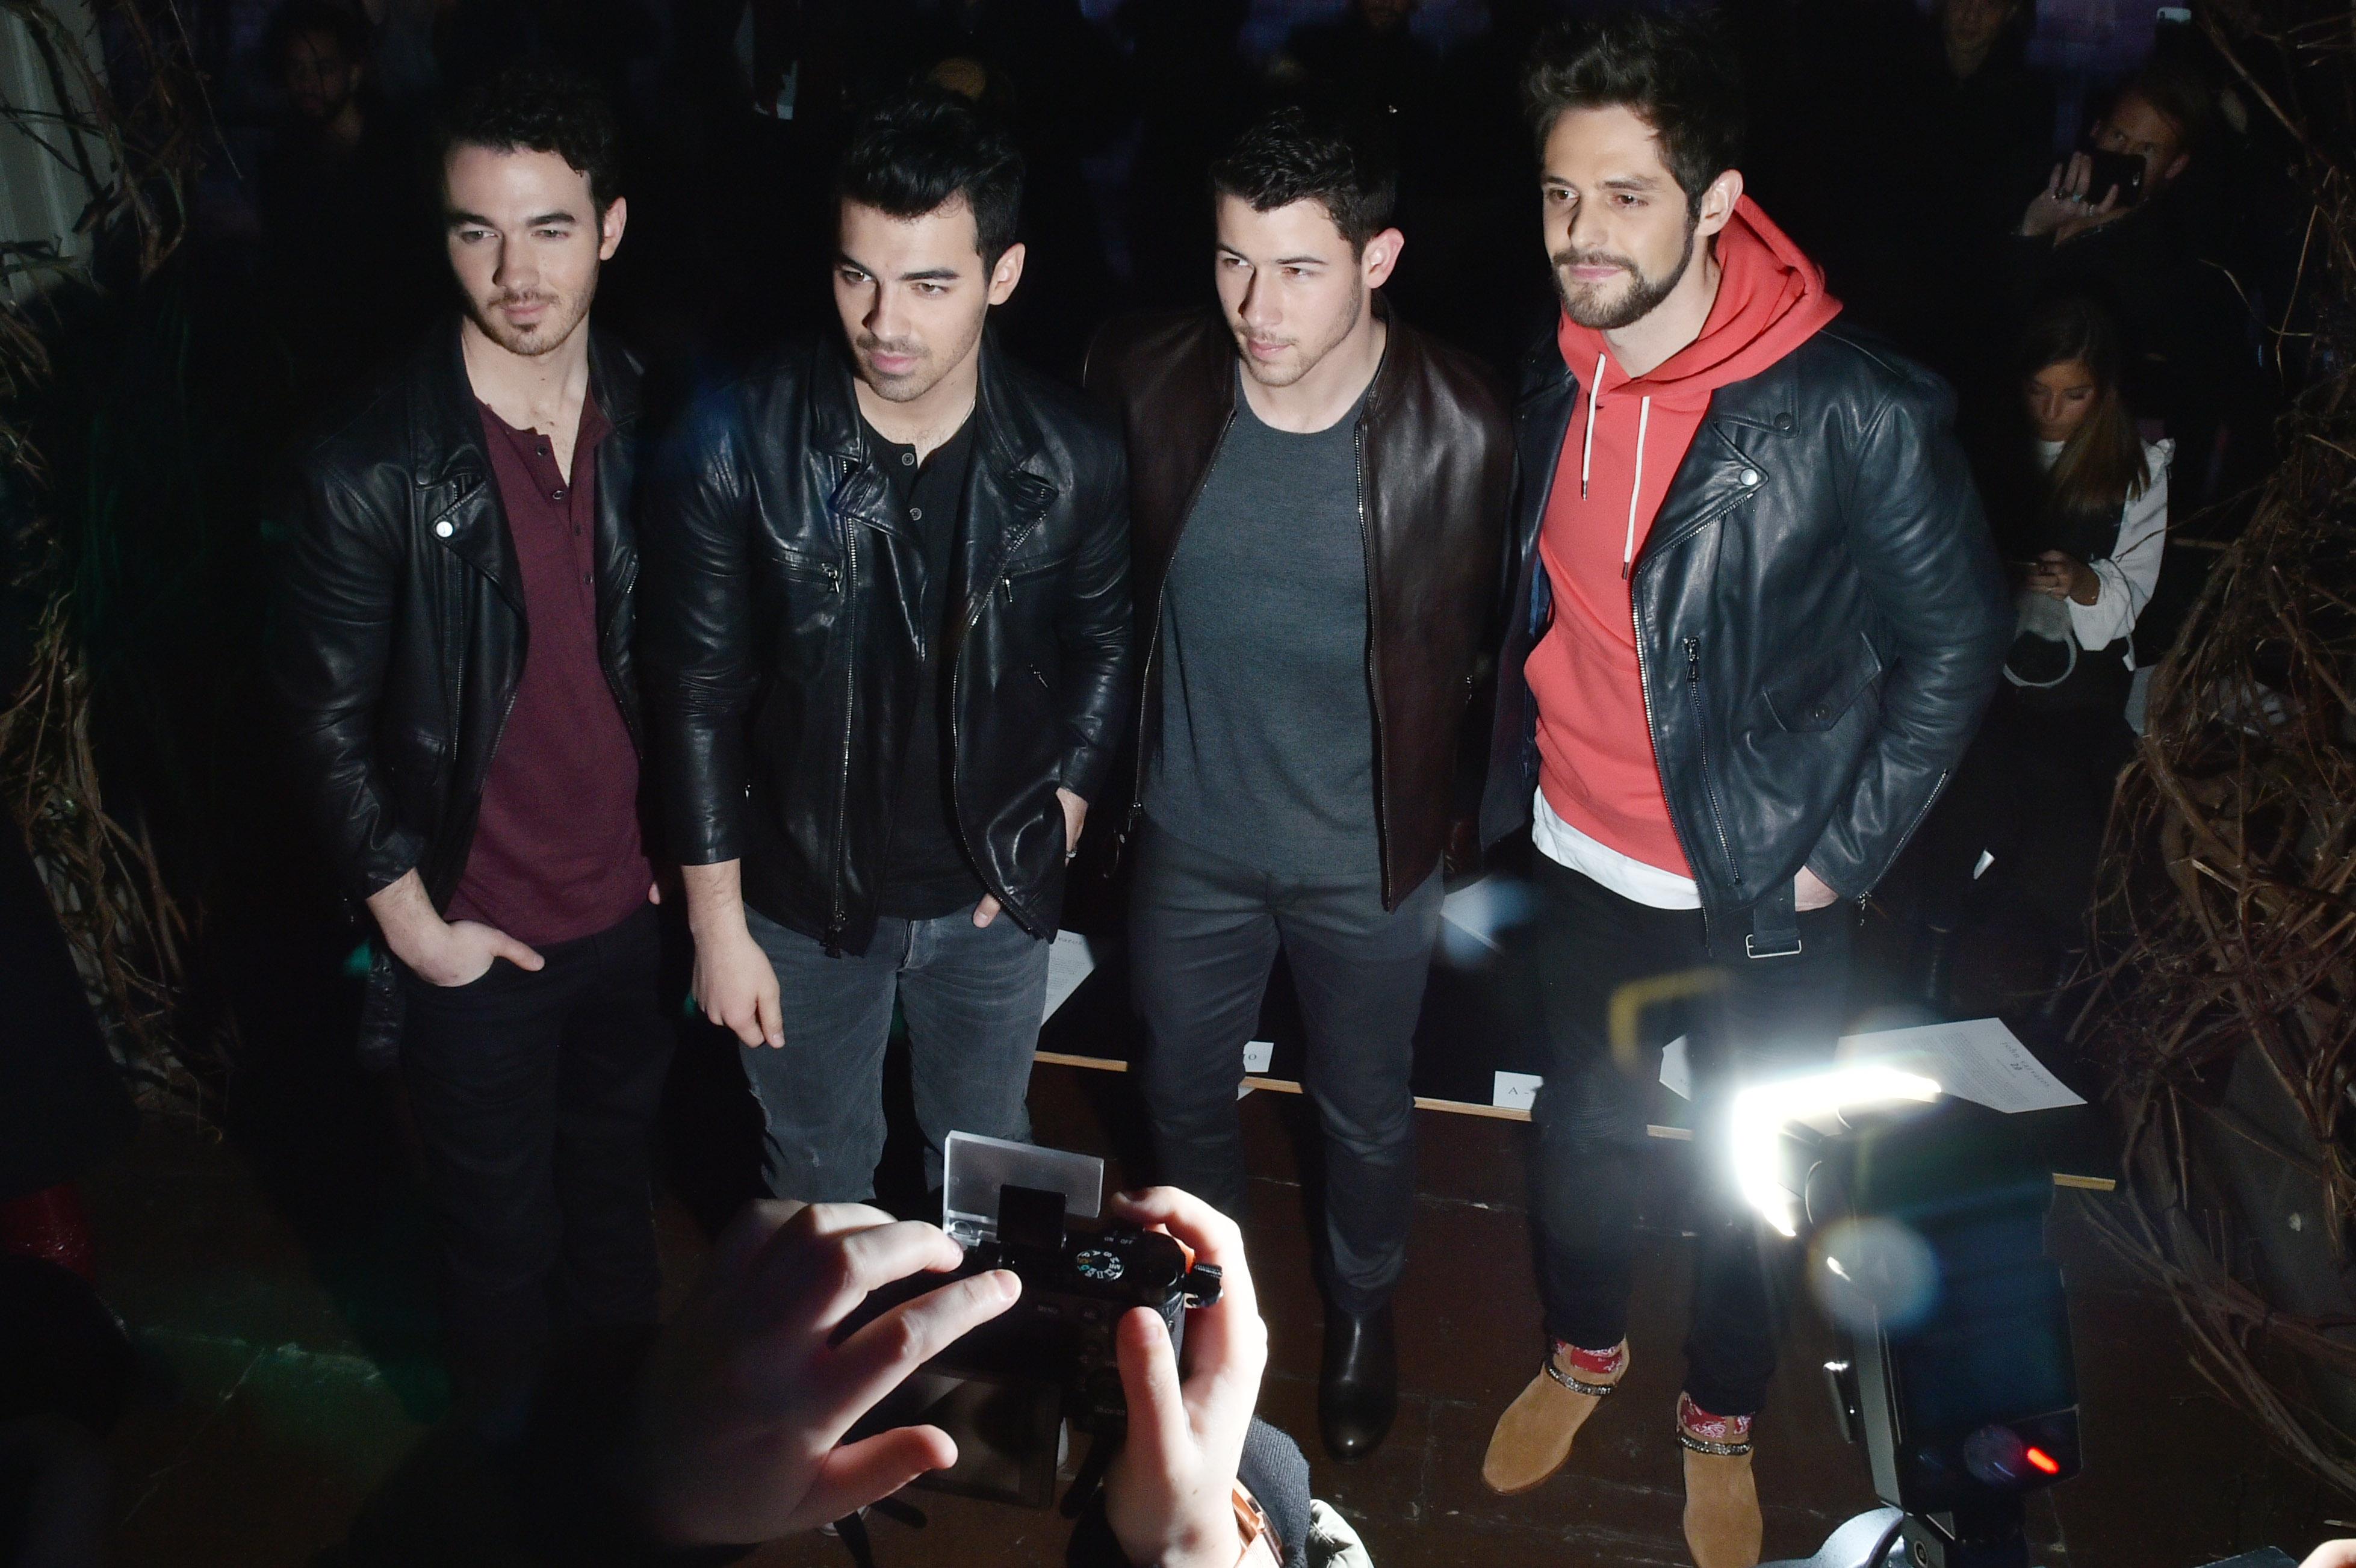 Kevin Jonas, Joe Jonas, Nick Jonas and Thomas RhettJohn Varvatos show, Front Row, Fall Winter 2018, New York Fashion Week Men's, USA - 26 Jan 2018